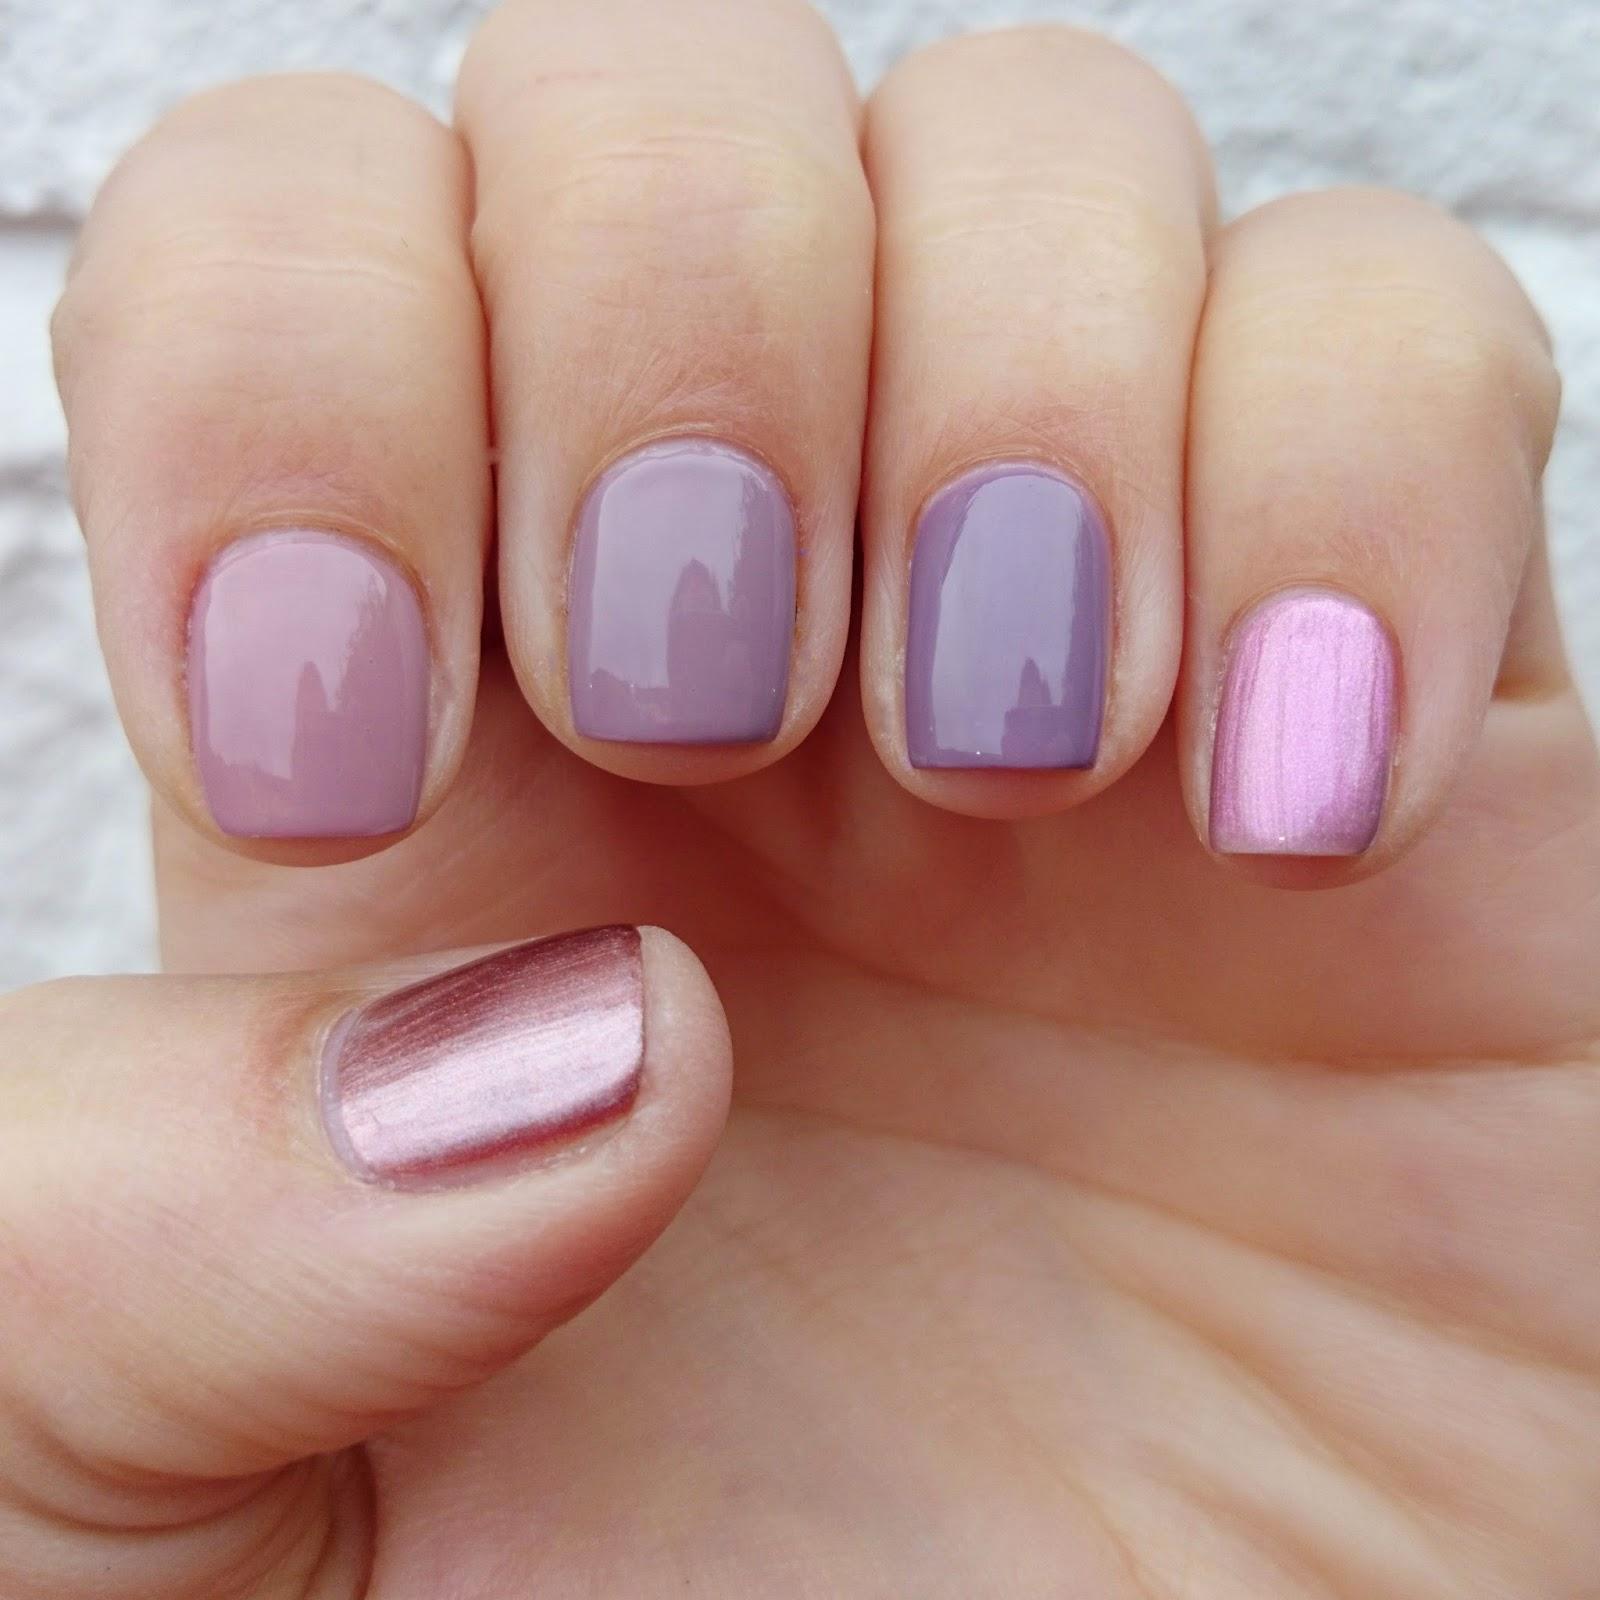 Dahlia Nails: Nail Geek - Sophisticats